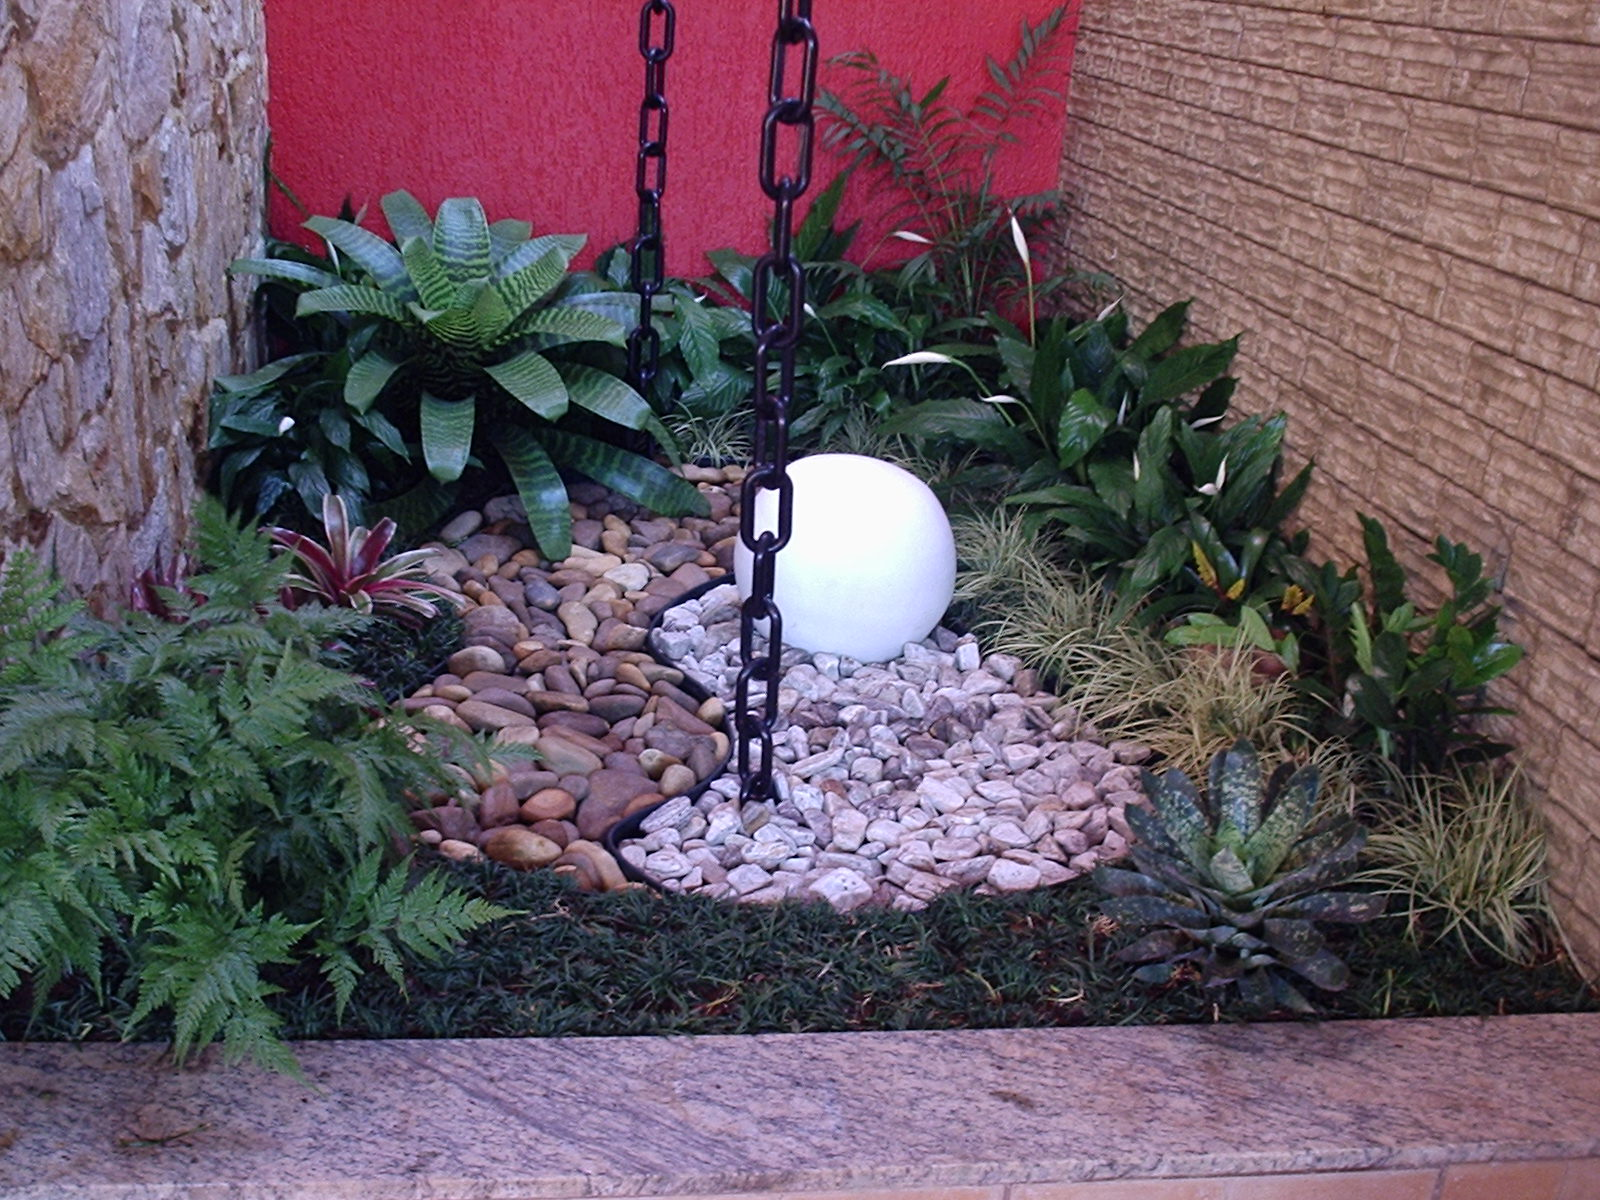 plantas de jardins tipos : plantas de jardins tipos:Modelos de jardim de Inverno 7